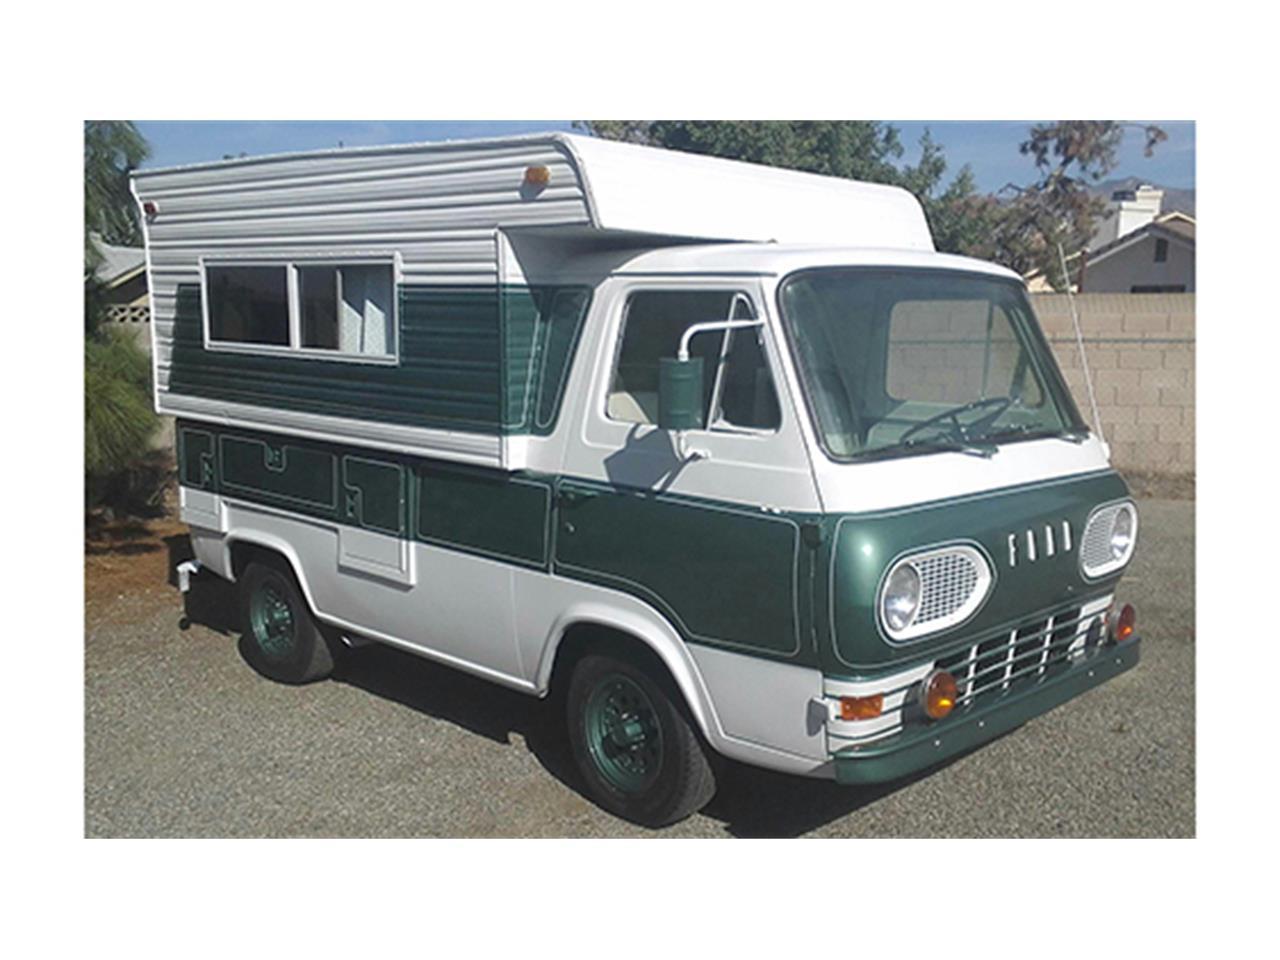 1964 Ford Econoline Camper Van For Sale Classiccars Com Cc 984756